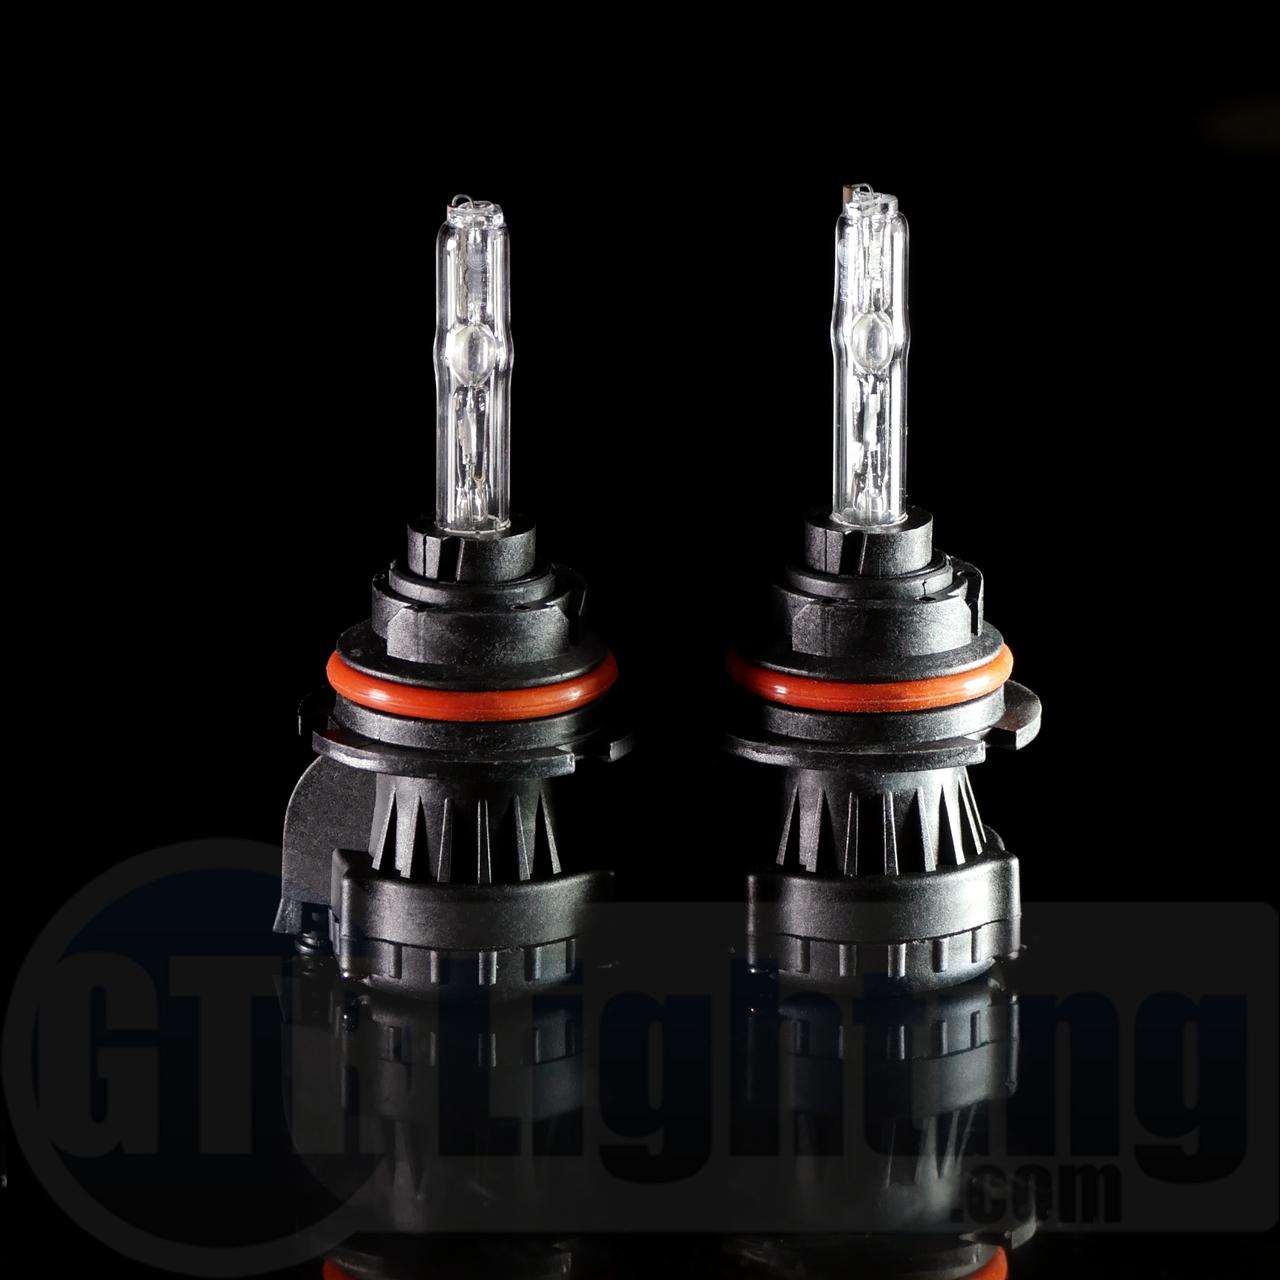 hight resolution of  headlight lens gtr lighting 35w 55w dual beam hid bulbs